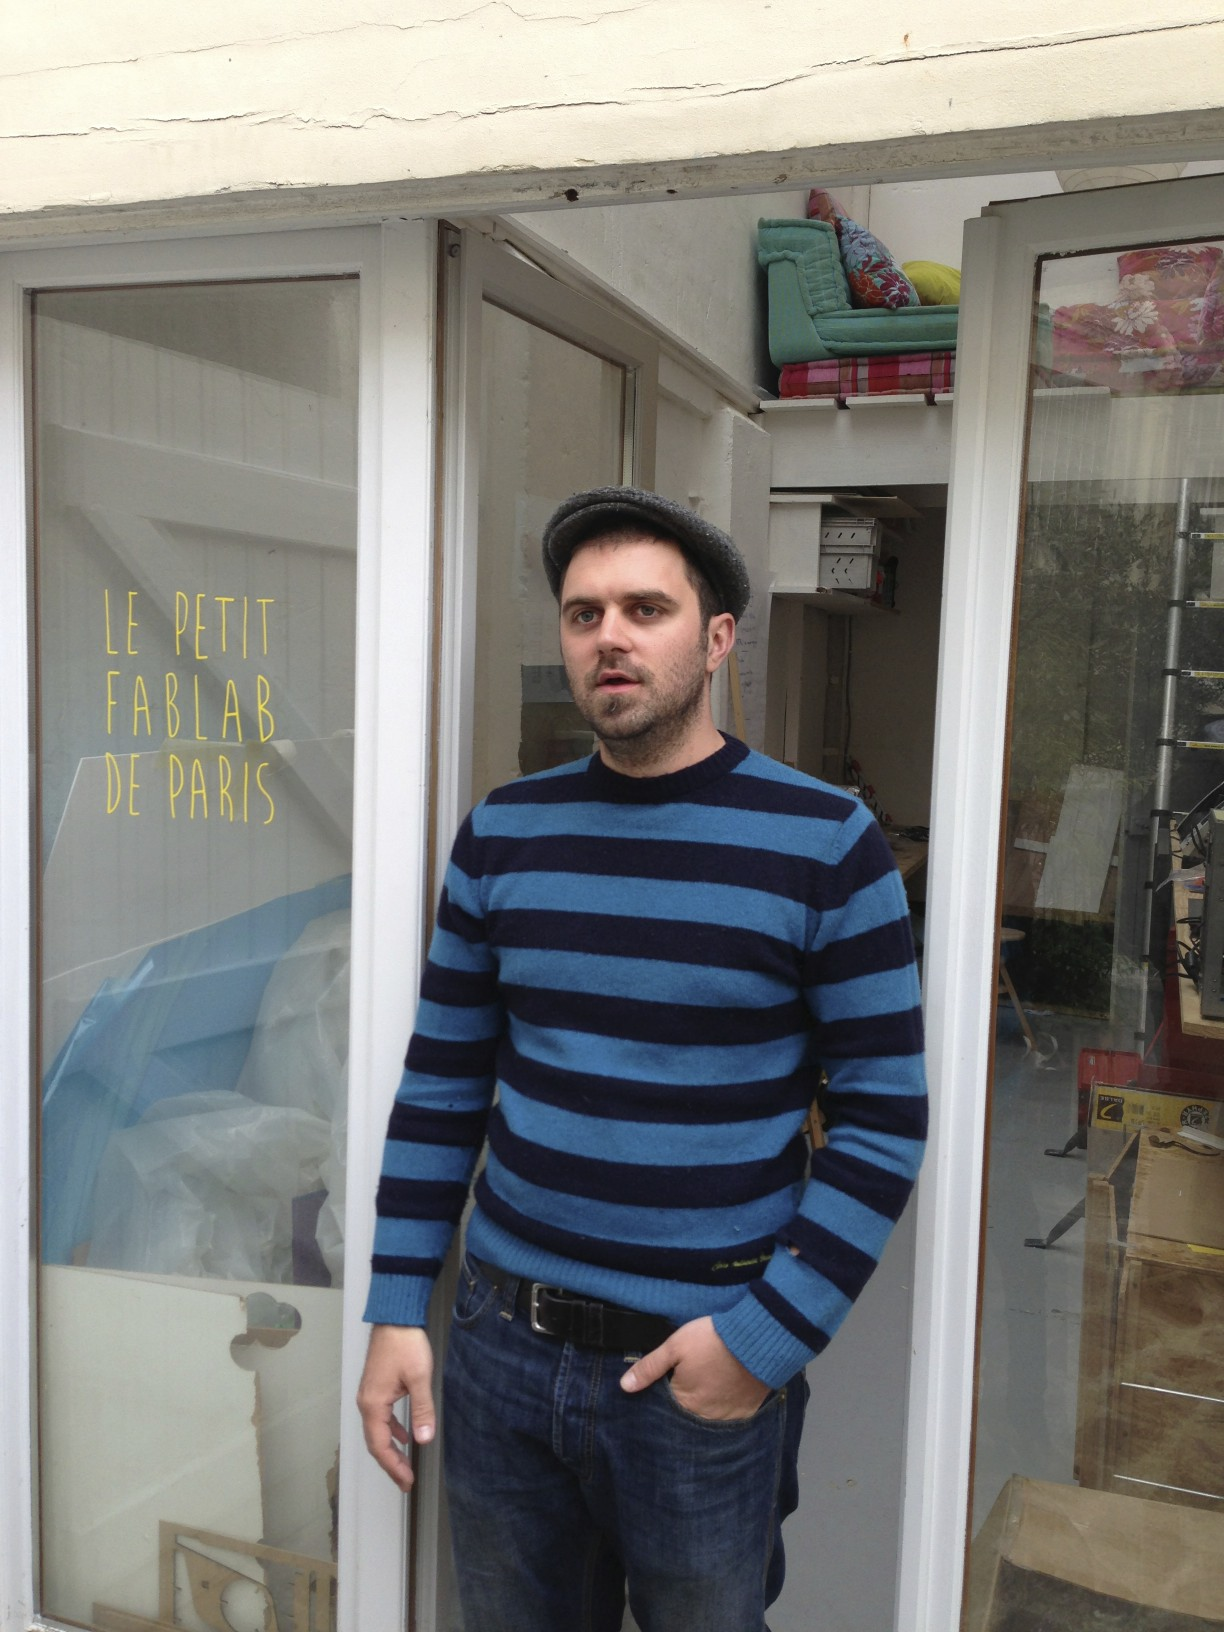 Artur Schmitt of Le Petit Fab Lab